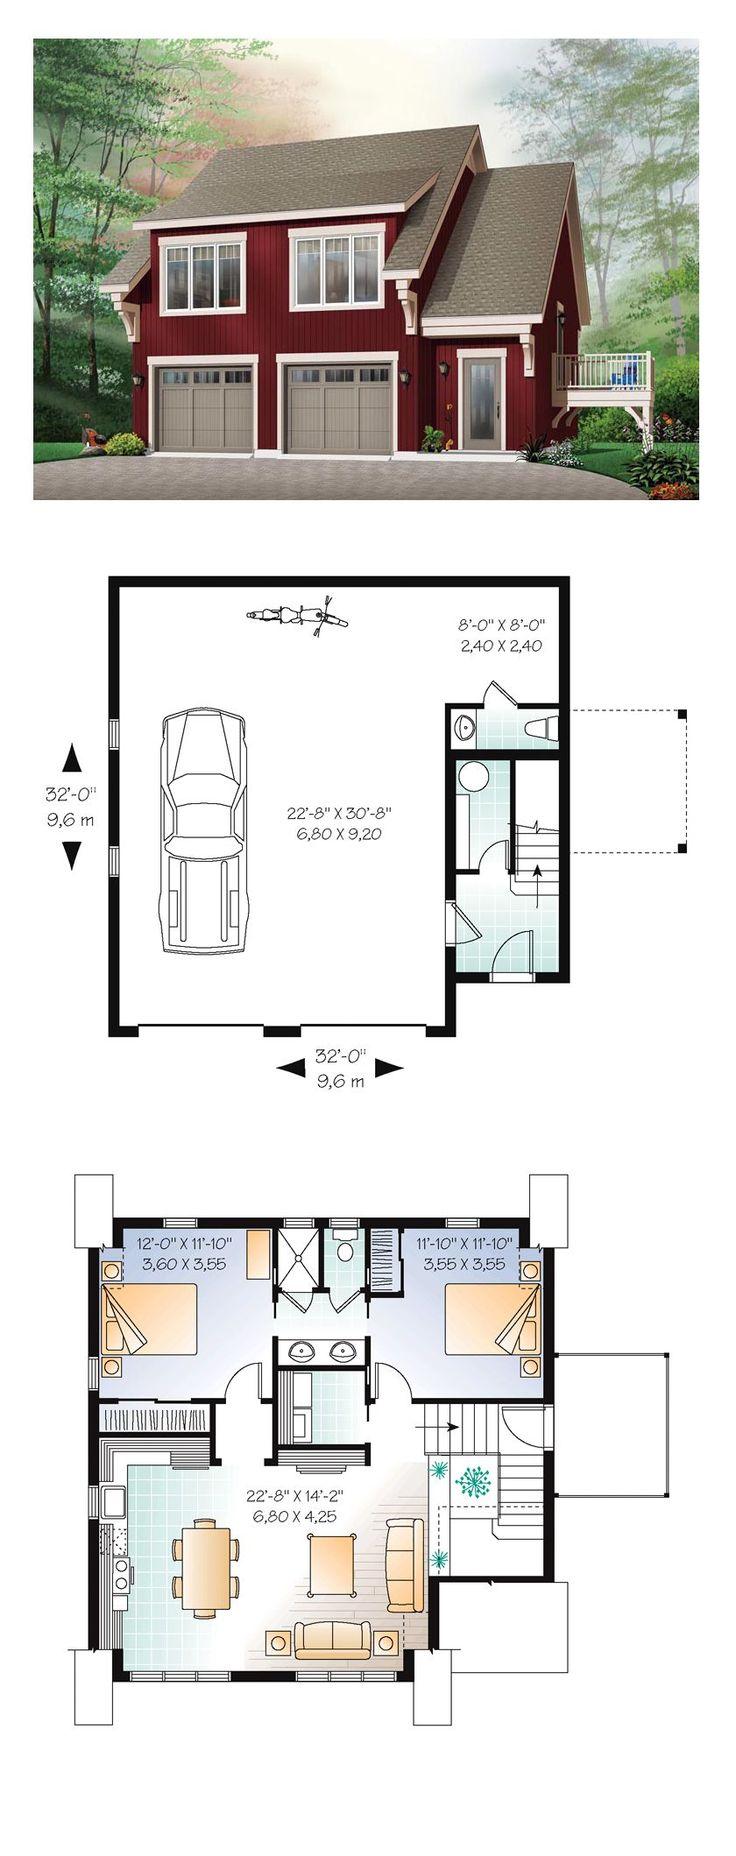 Best 25 Carriage house plans ideas on Pinterest  Garage